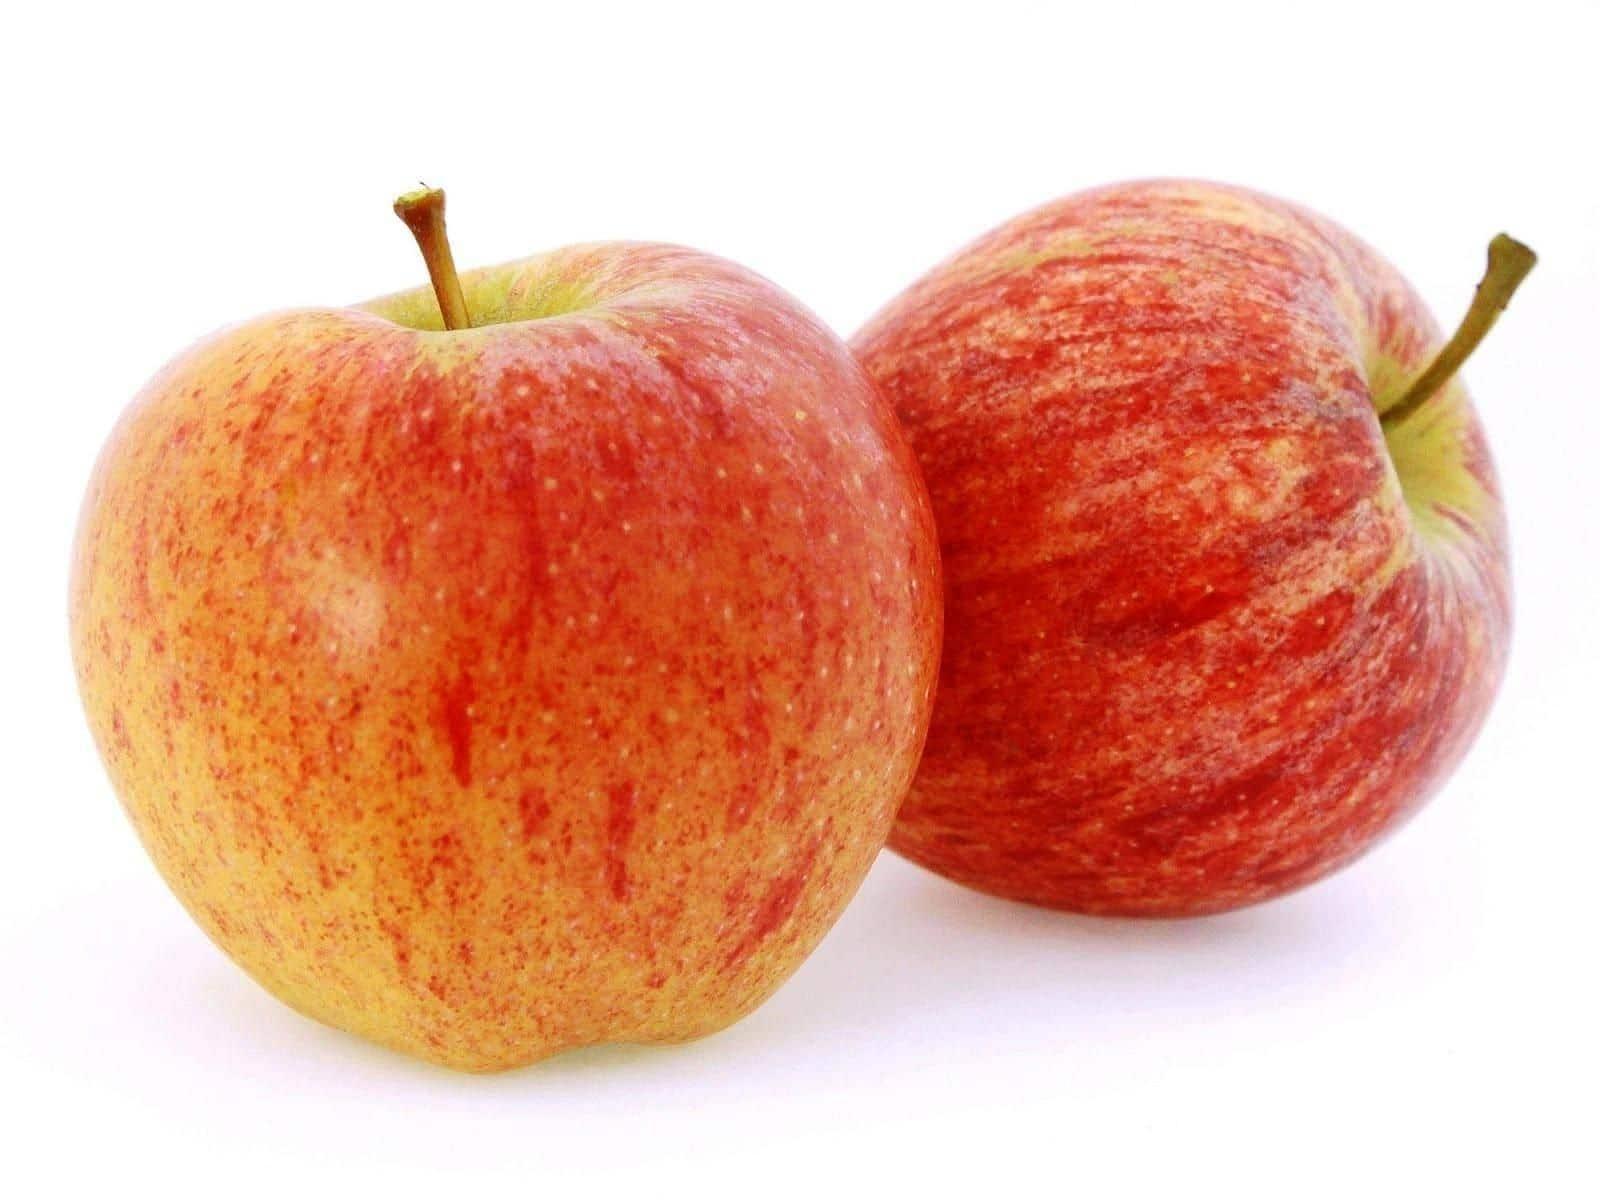 apple dream meaning, dream about apple, apple dream interpretation, seeing in a dream apple